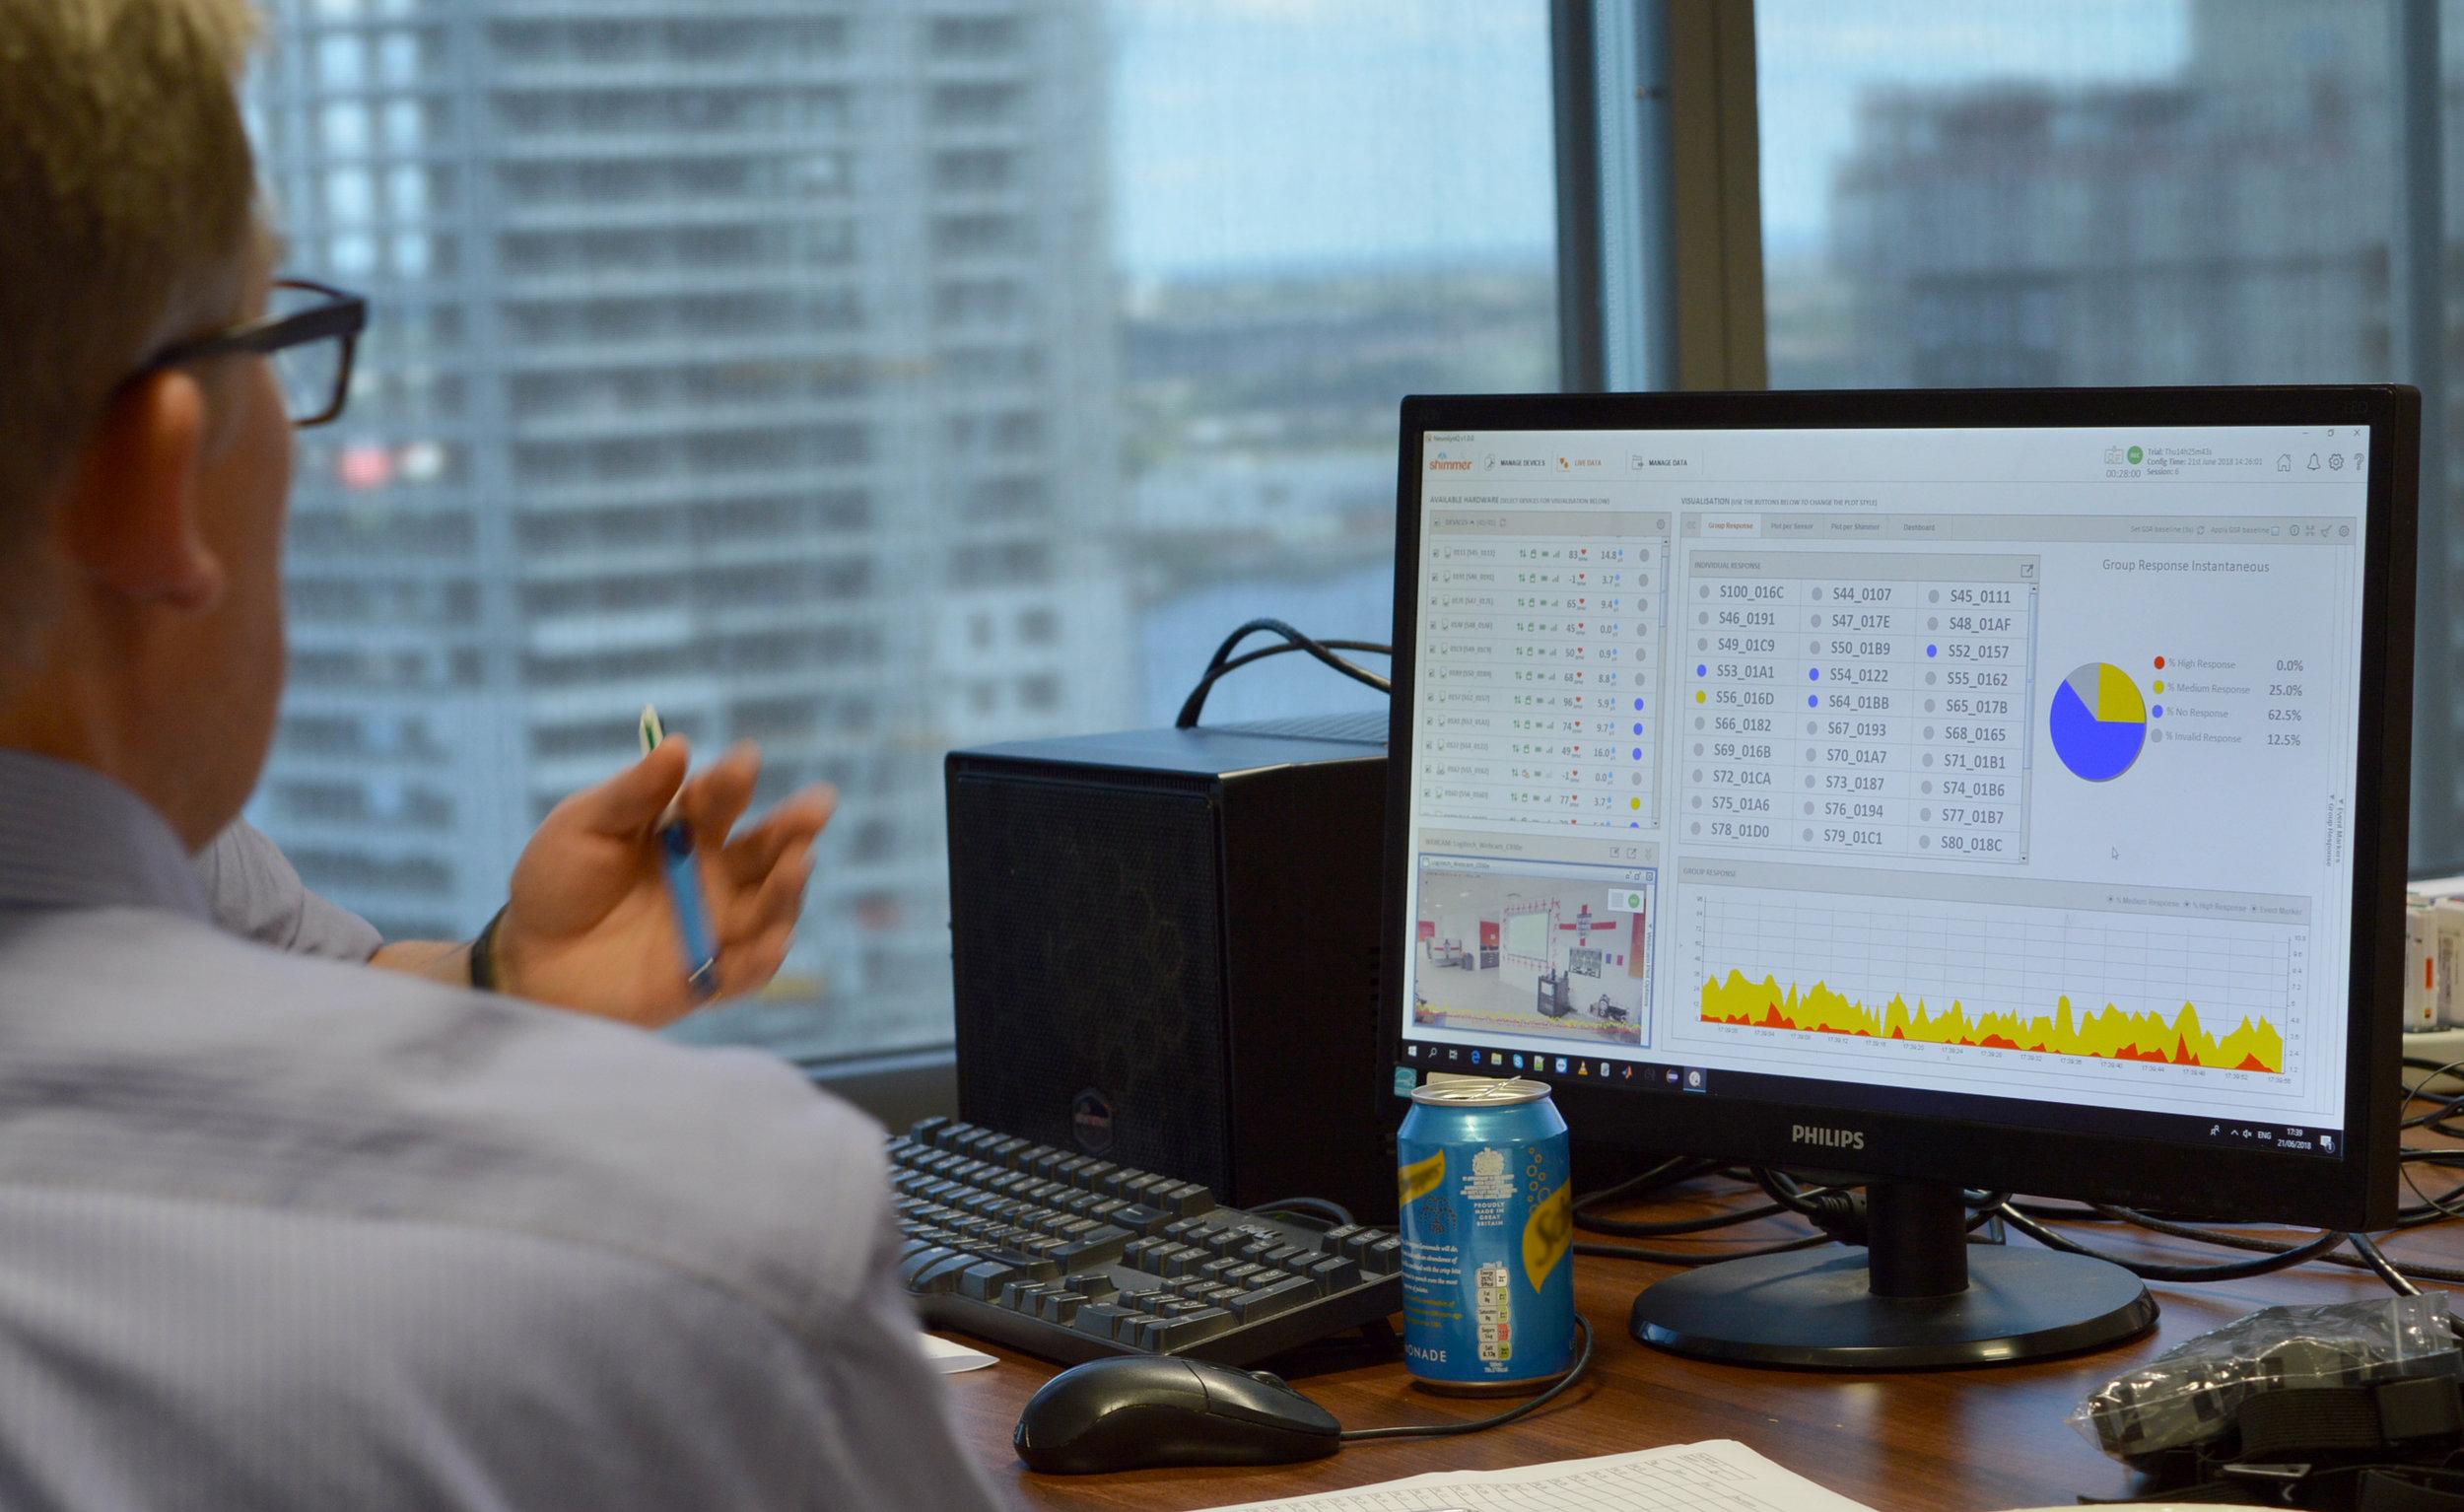 Geoff-Looking-at-NeuroLynQ-Screen.jpg